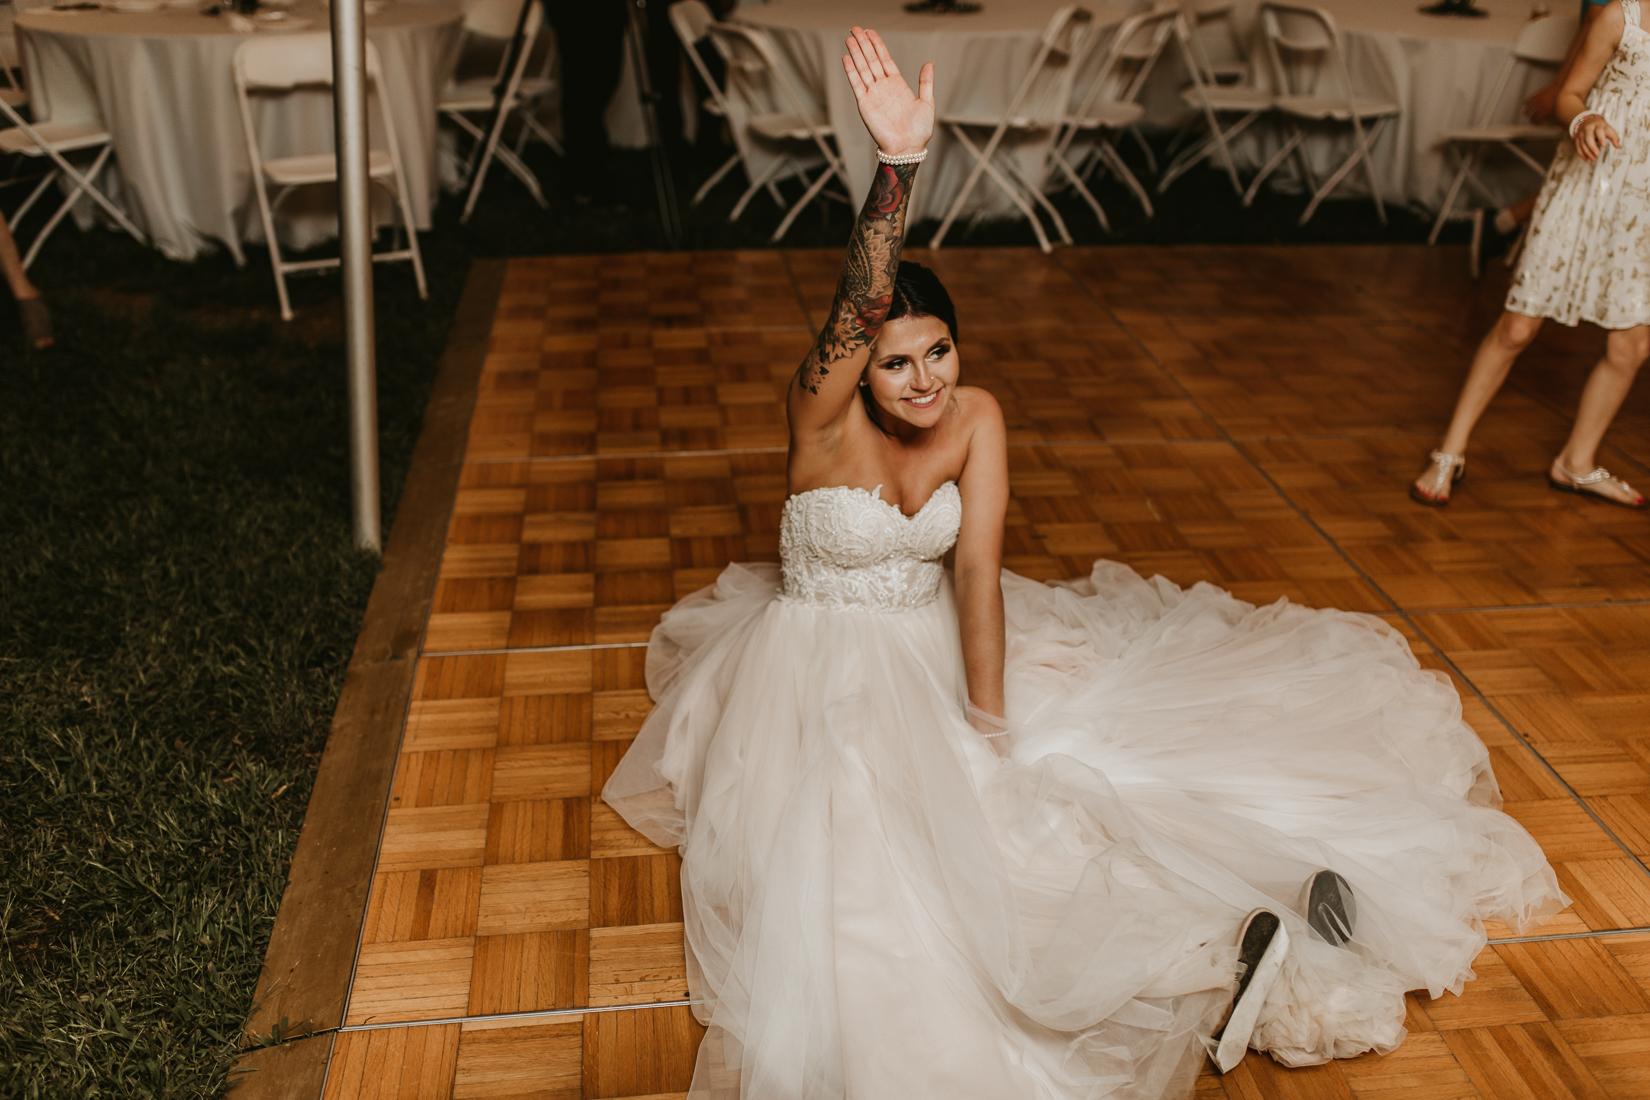 olivia_zay_wedding_09_2018-9210.jpg